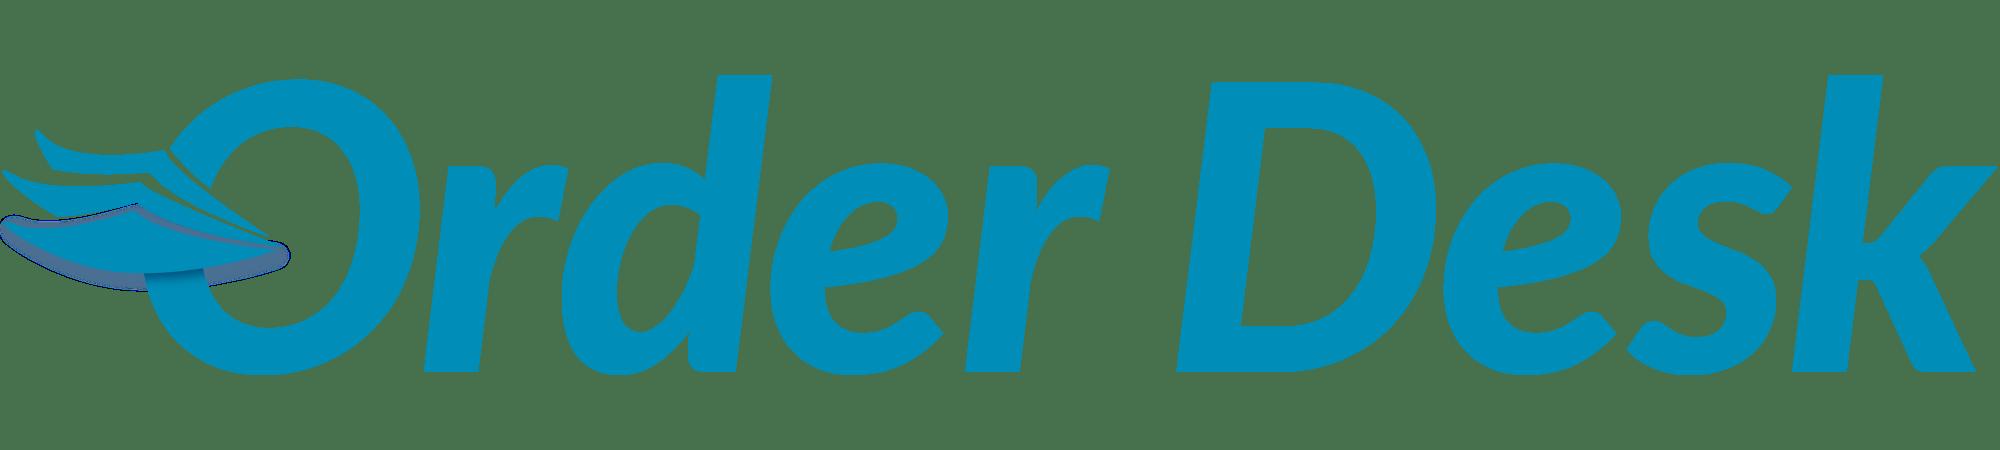 Order Desk company logo